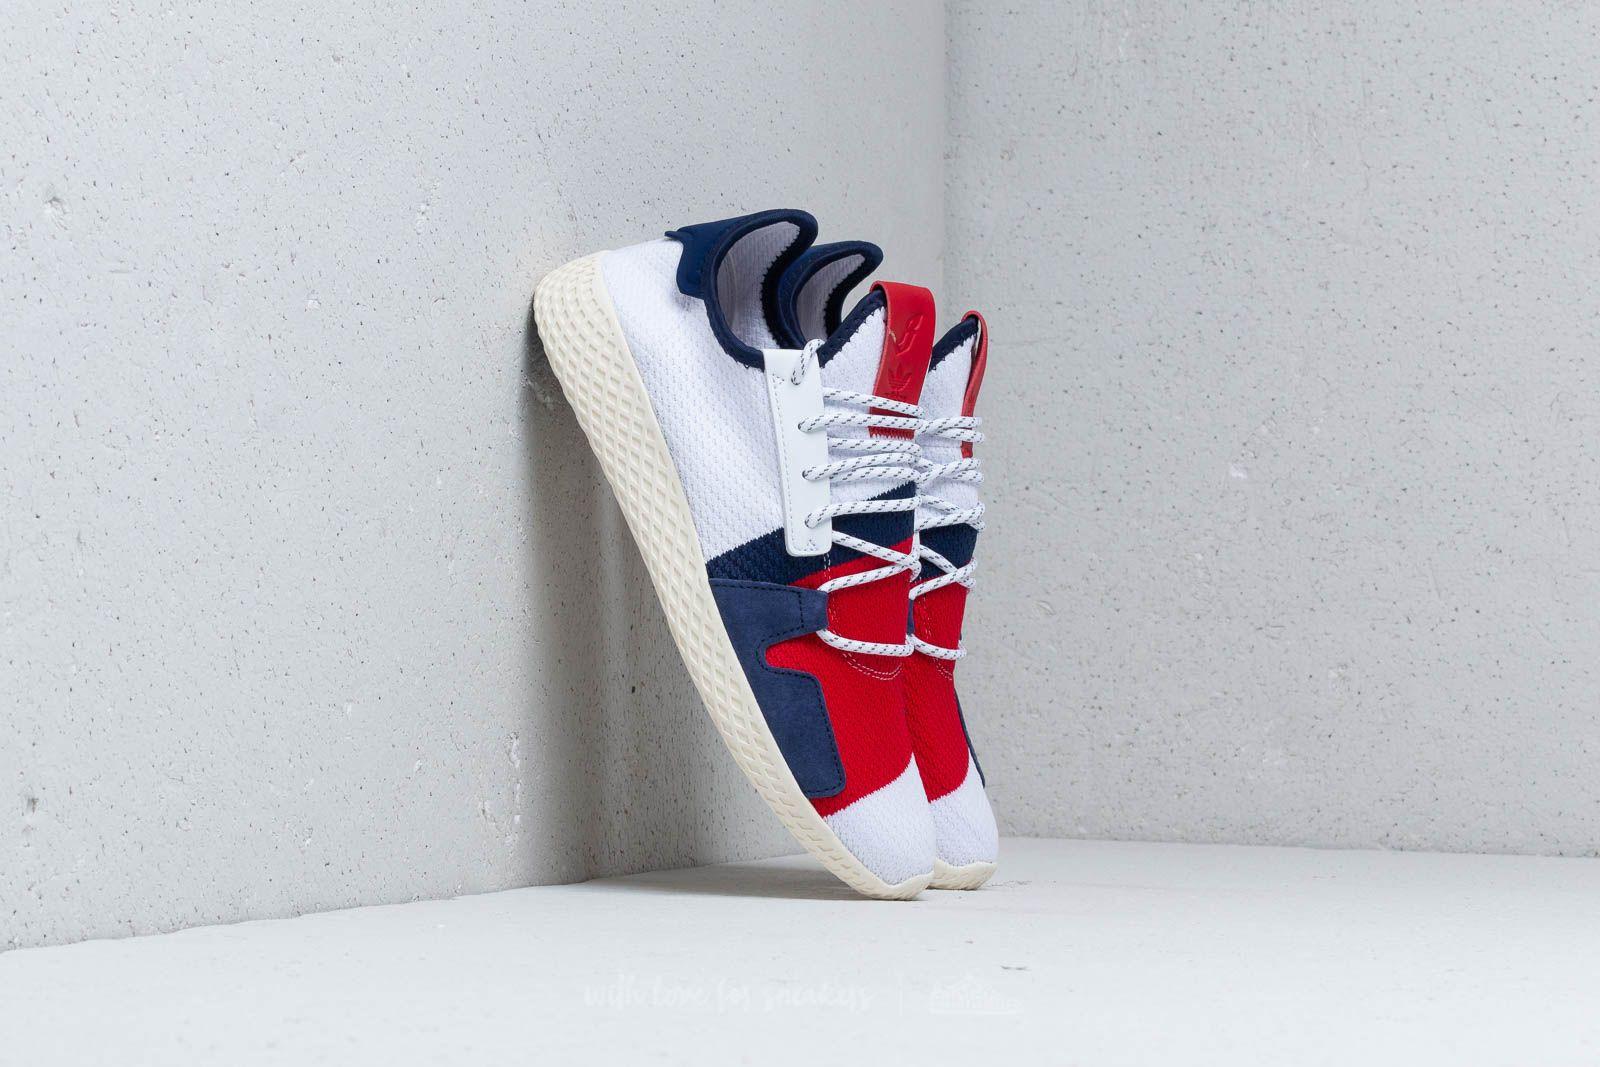 adidas x Pharrell Williams BBC Hu V2 Footwear White/ Scarlet za skvělou cenu 3 350 Kč koupíte na Footshop.cz